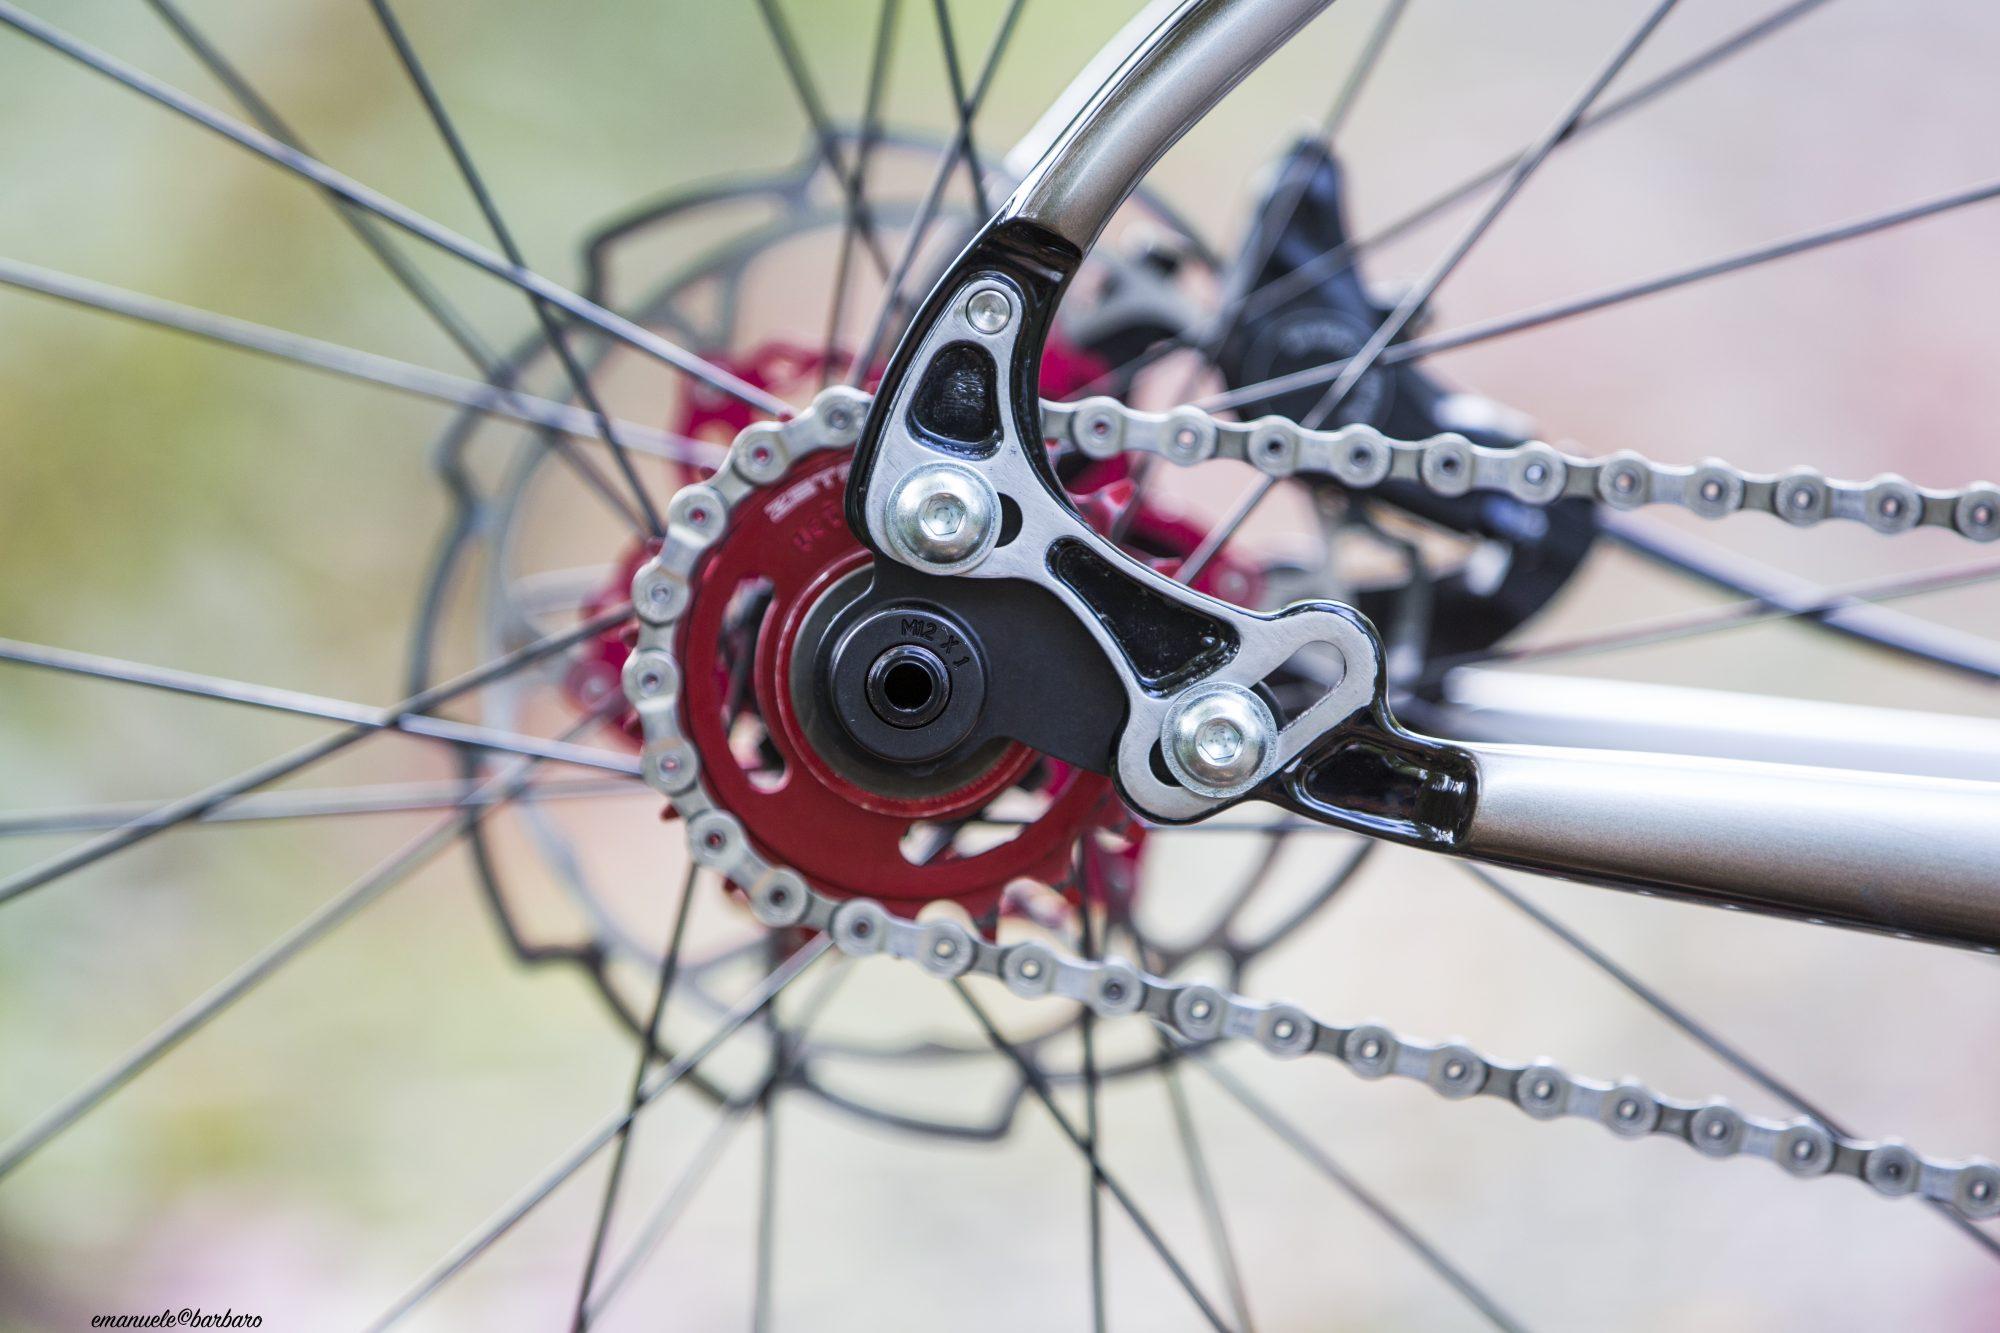 singlespeed bice bicycles 29er endurello enduro hardtail bespoke handcrafted